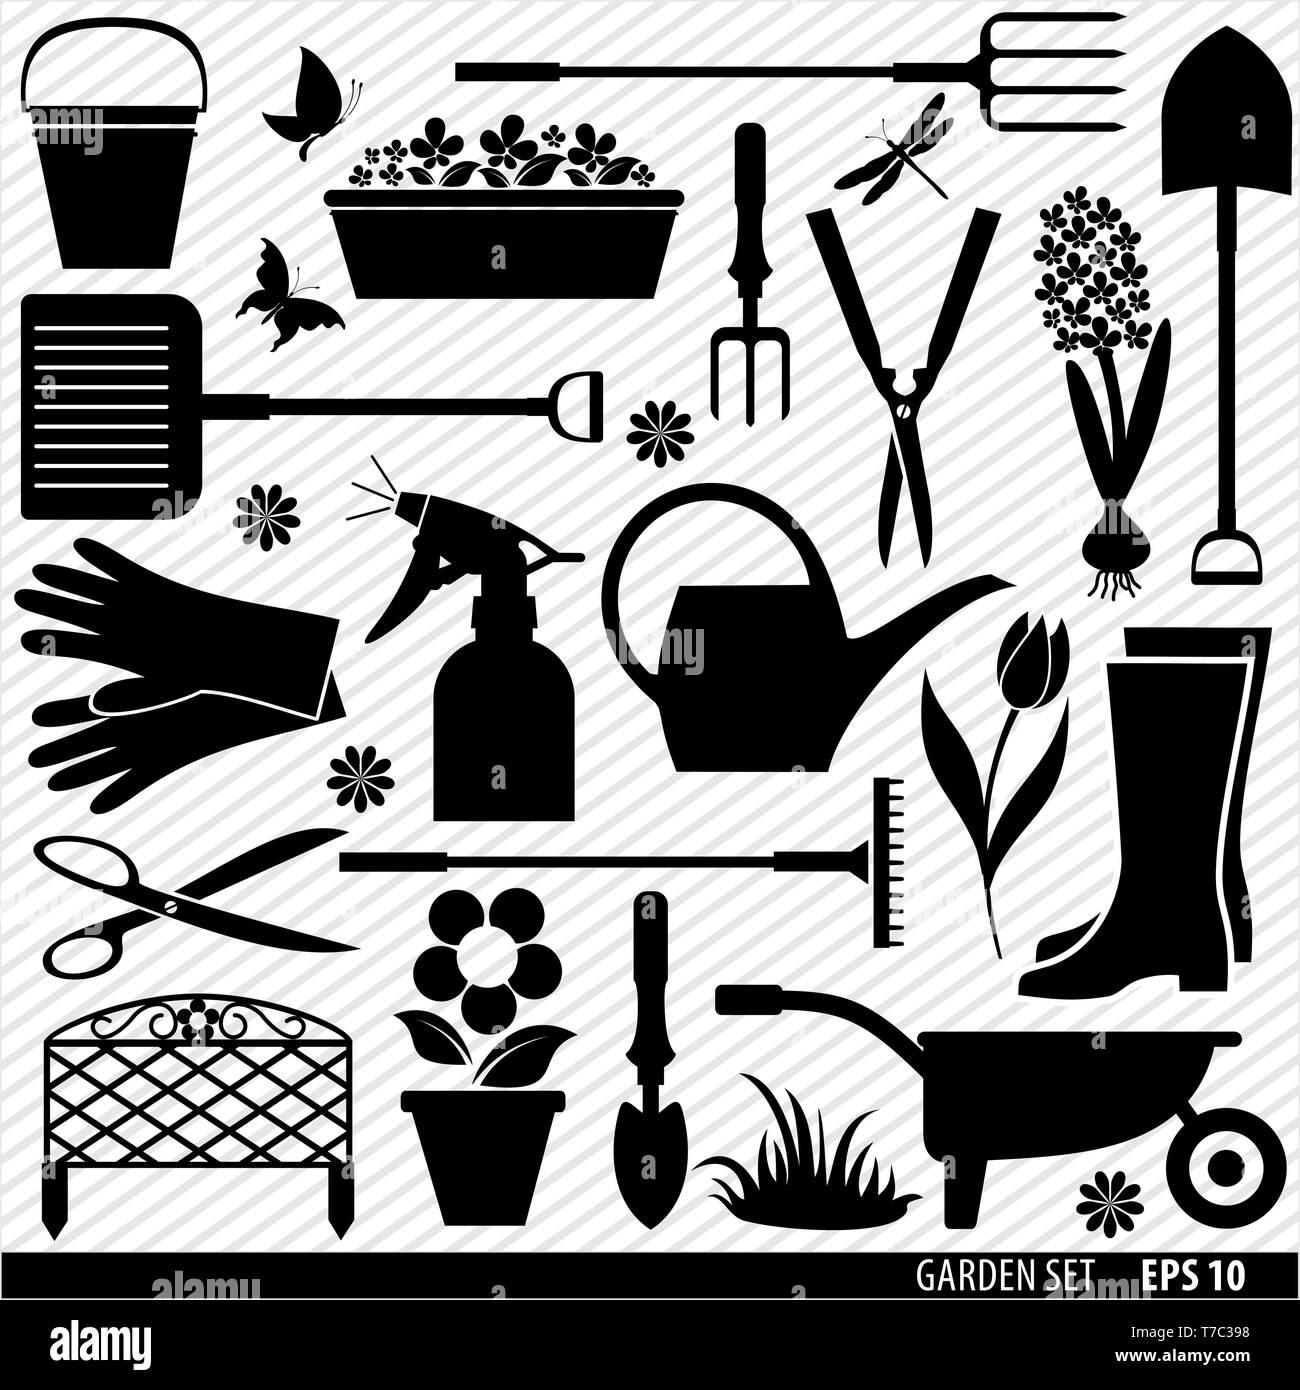 Village tools icon set. Vector stock illustration - Stock Vector